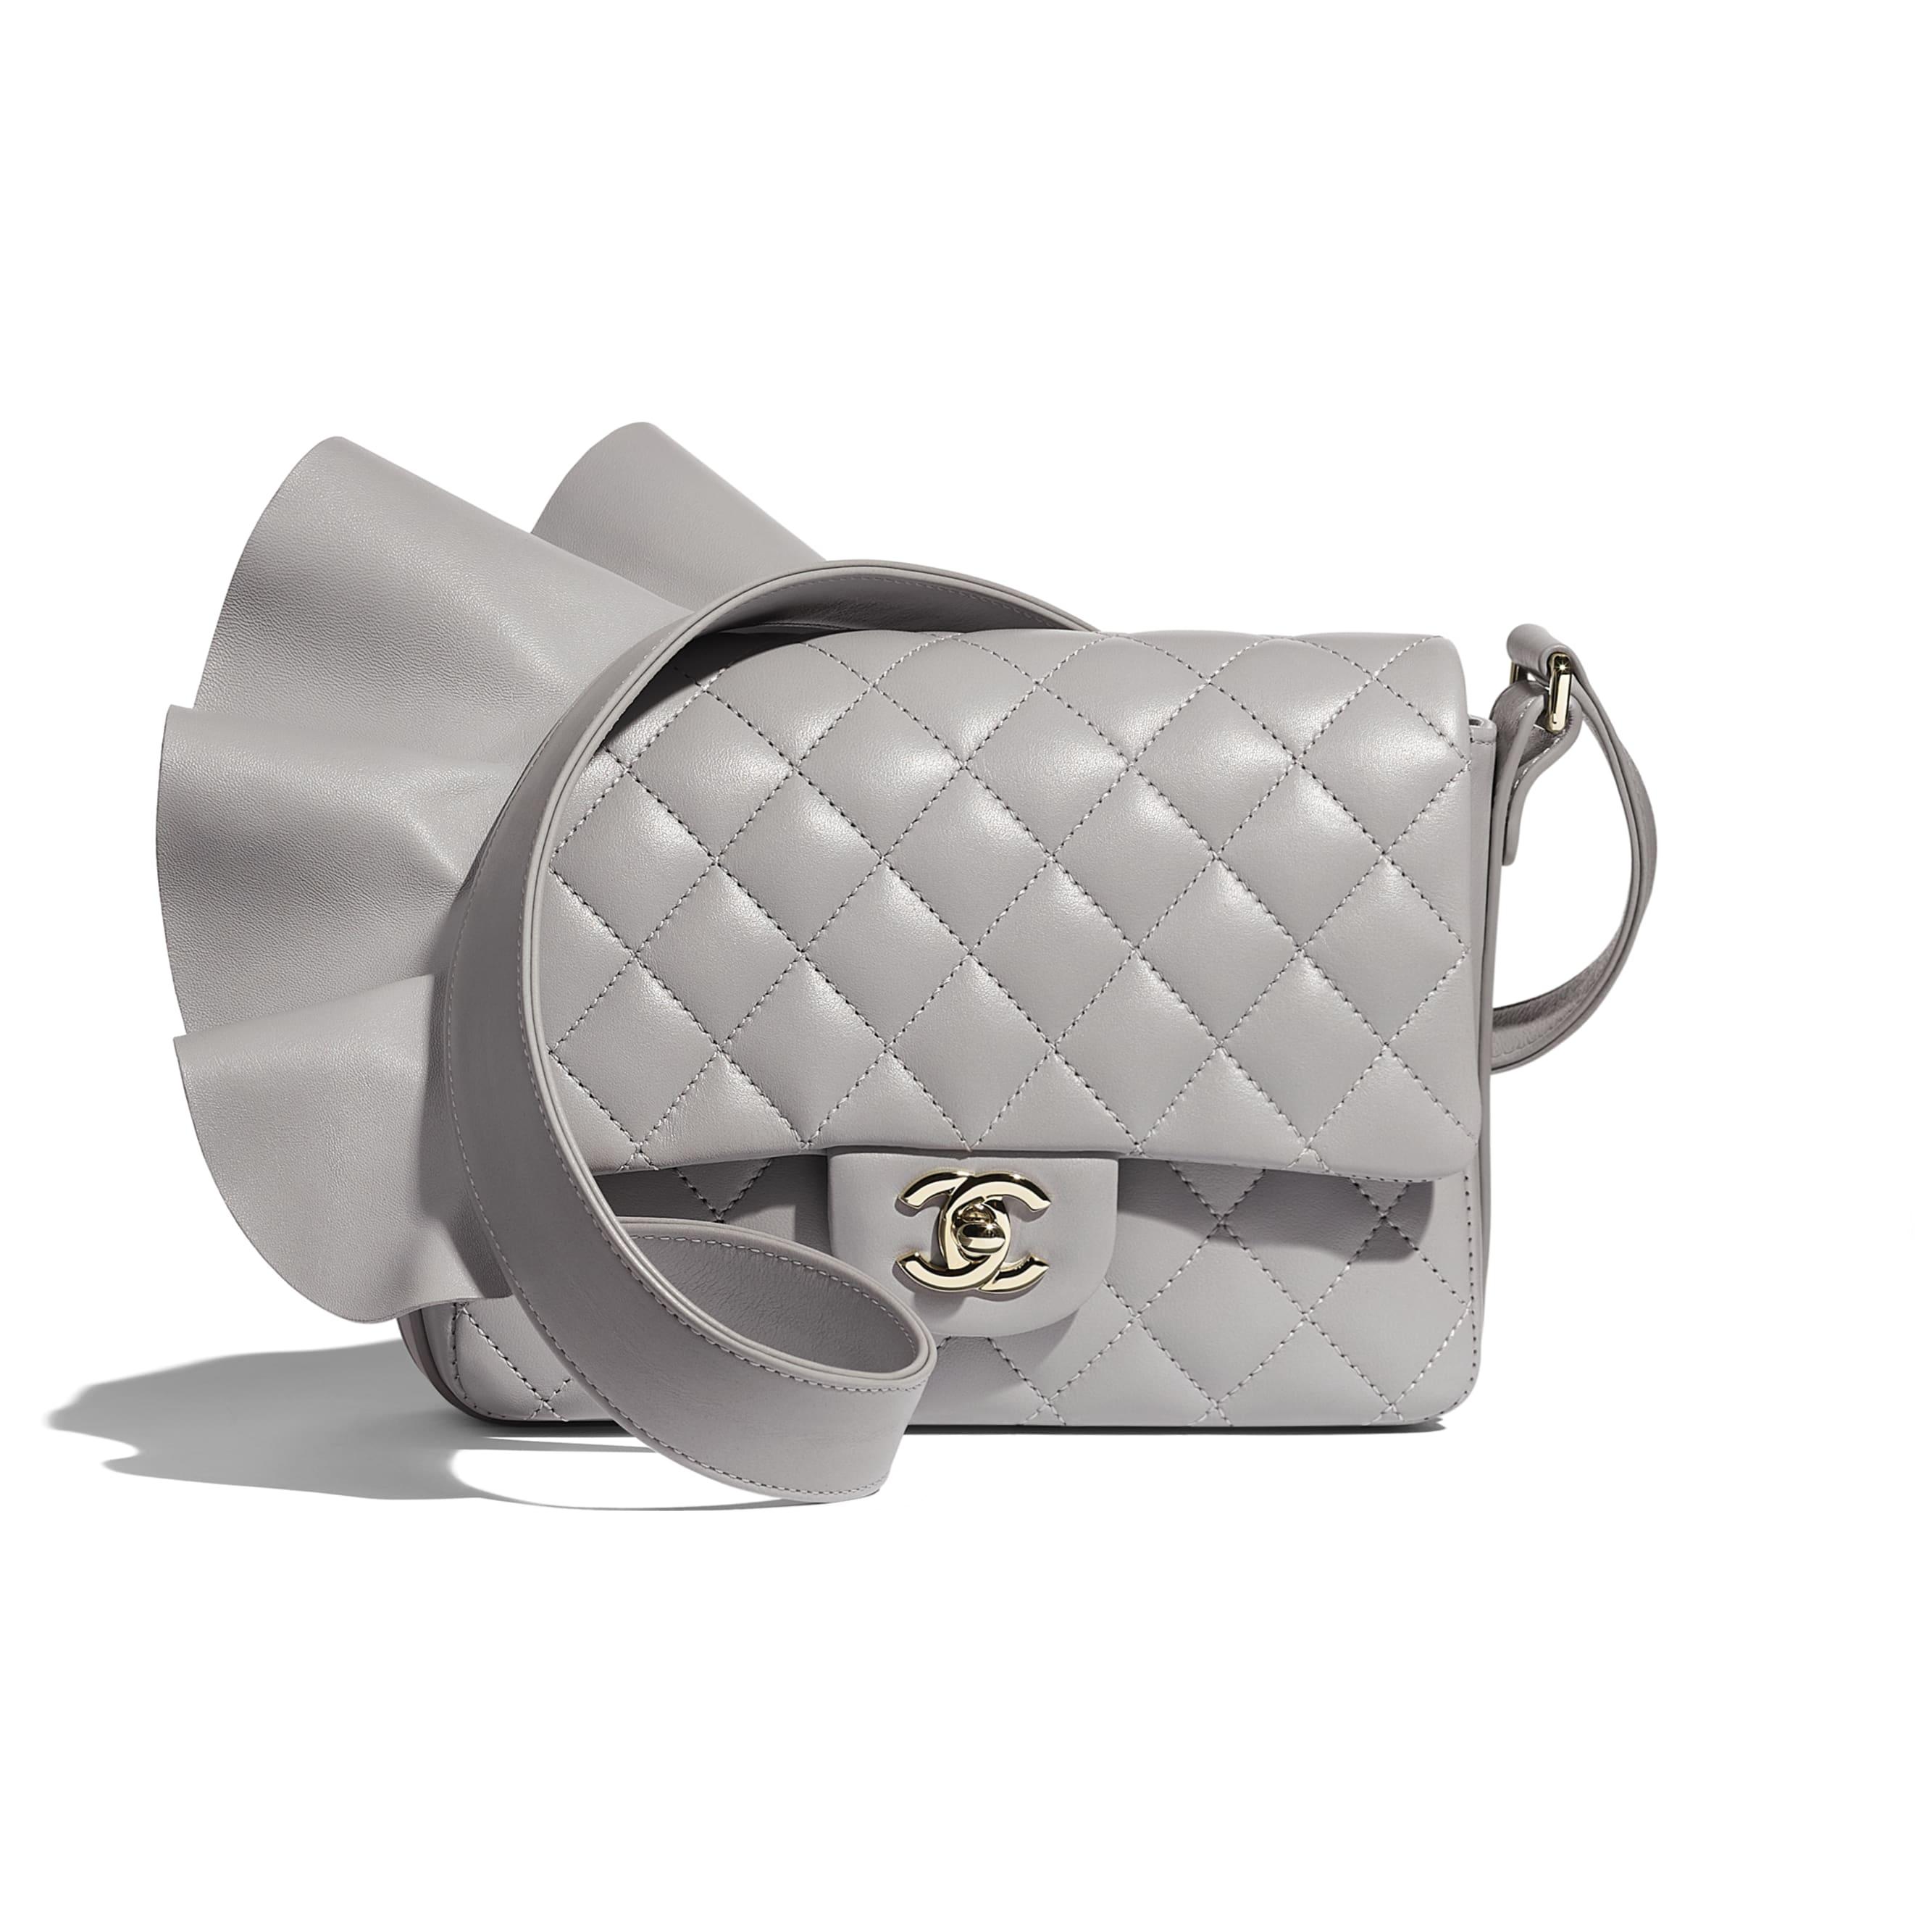 Flap Bag - Light Grey - Lambskin, Calfskin & Gold-Tone Metal - CHANEL - Default view - see standard sized version